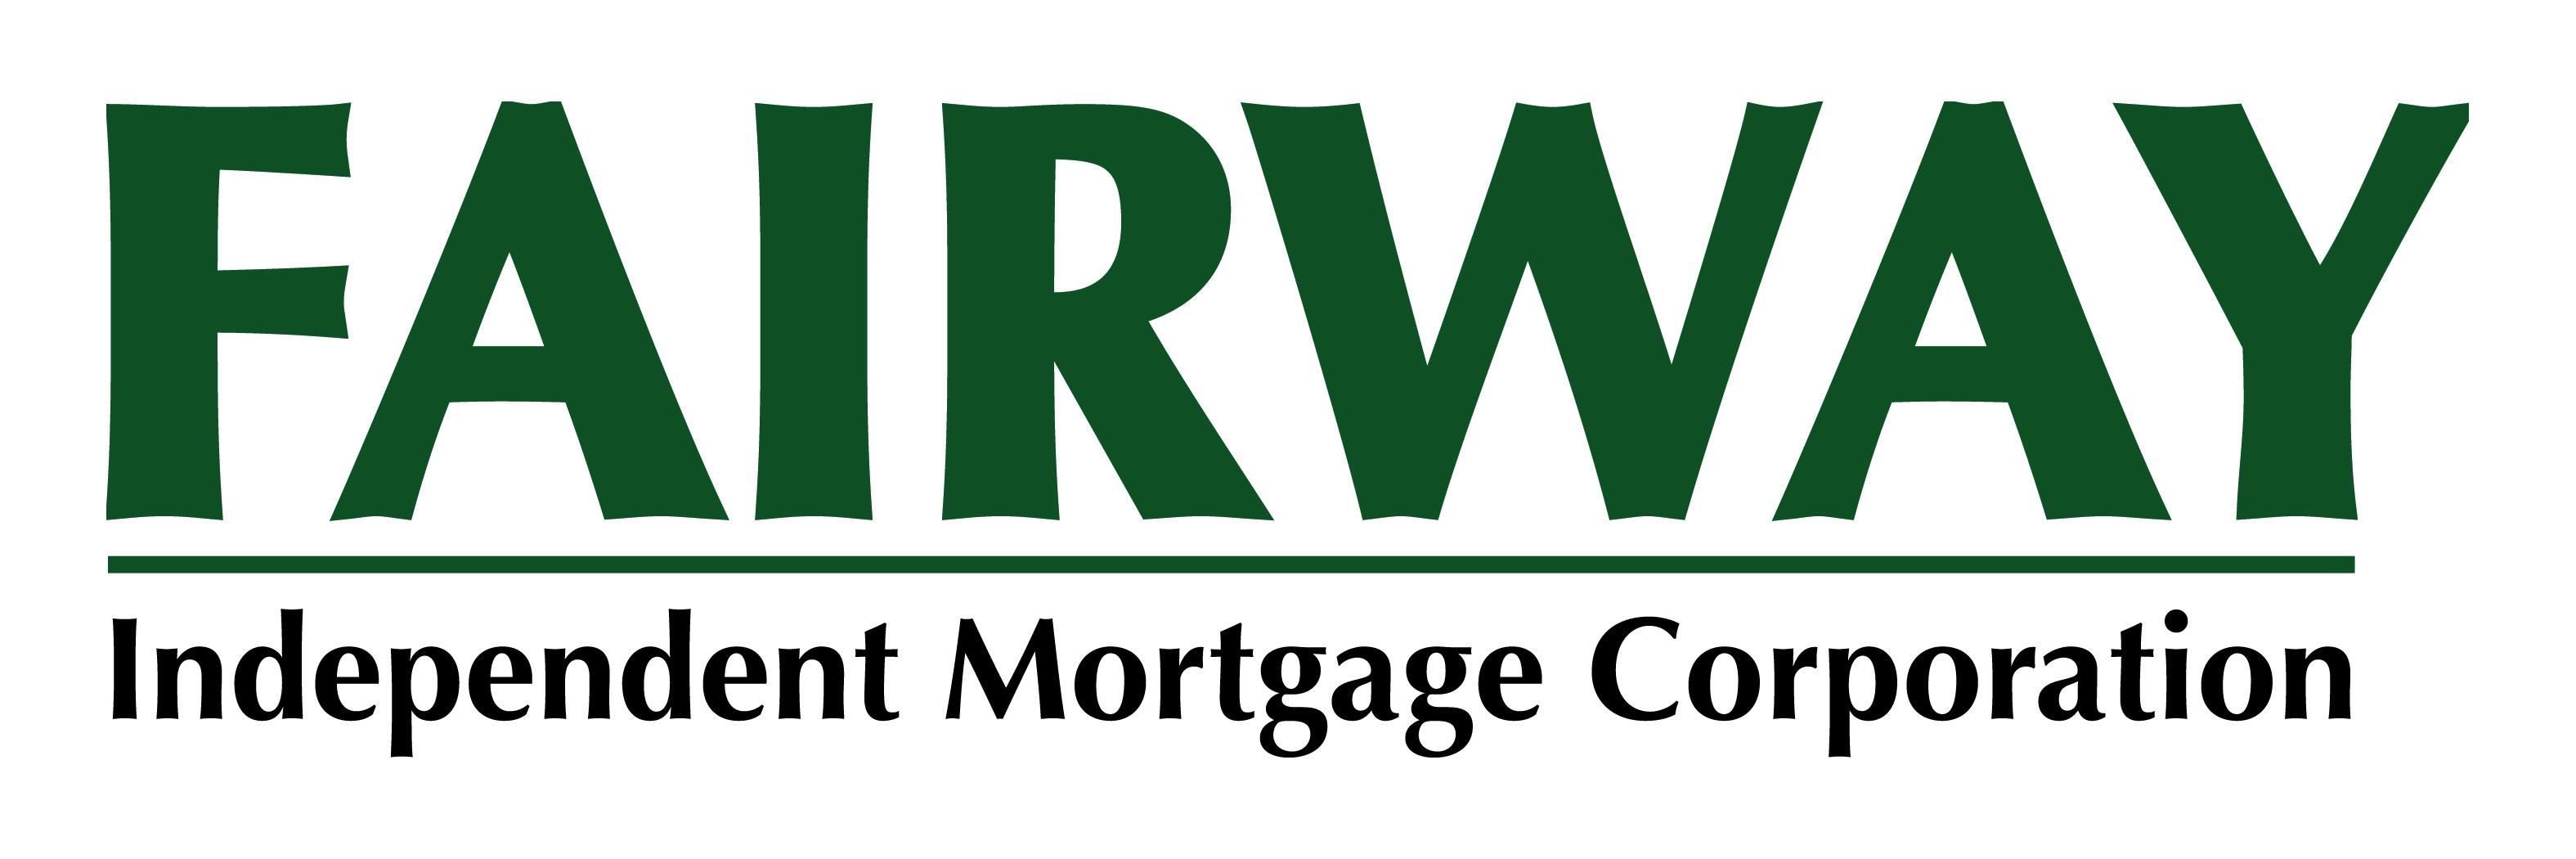 Fairway Independent Mortgage